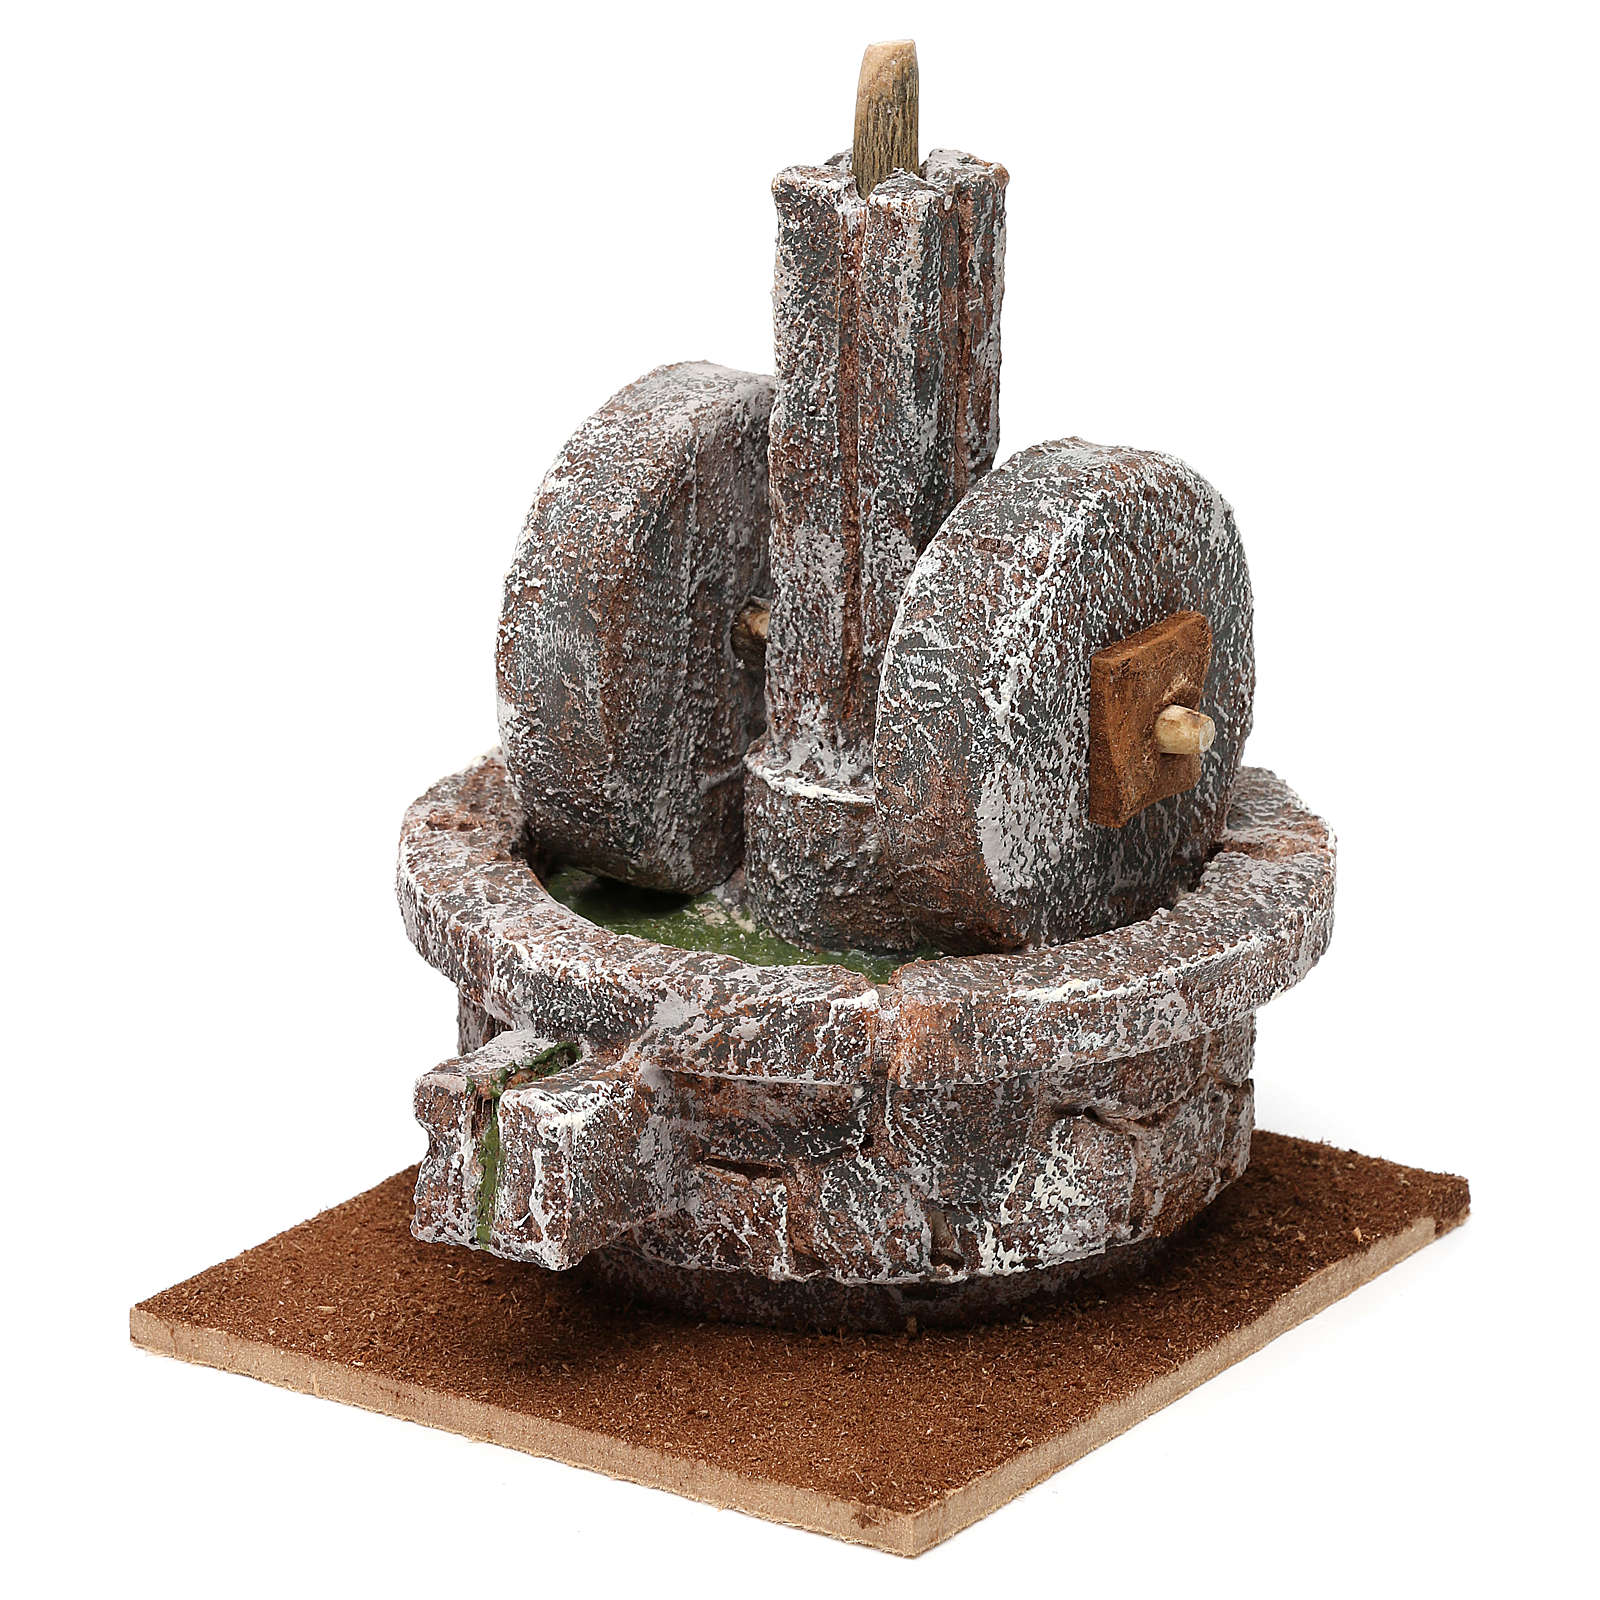 Millstone for 10 cm Nativity scene, 15x10x10 cm 4